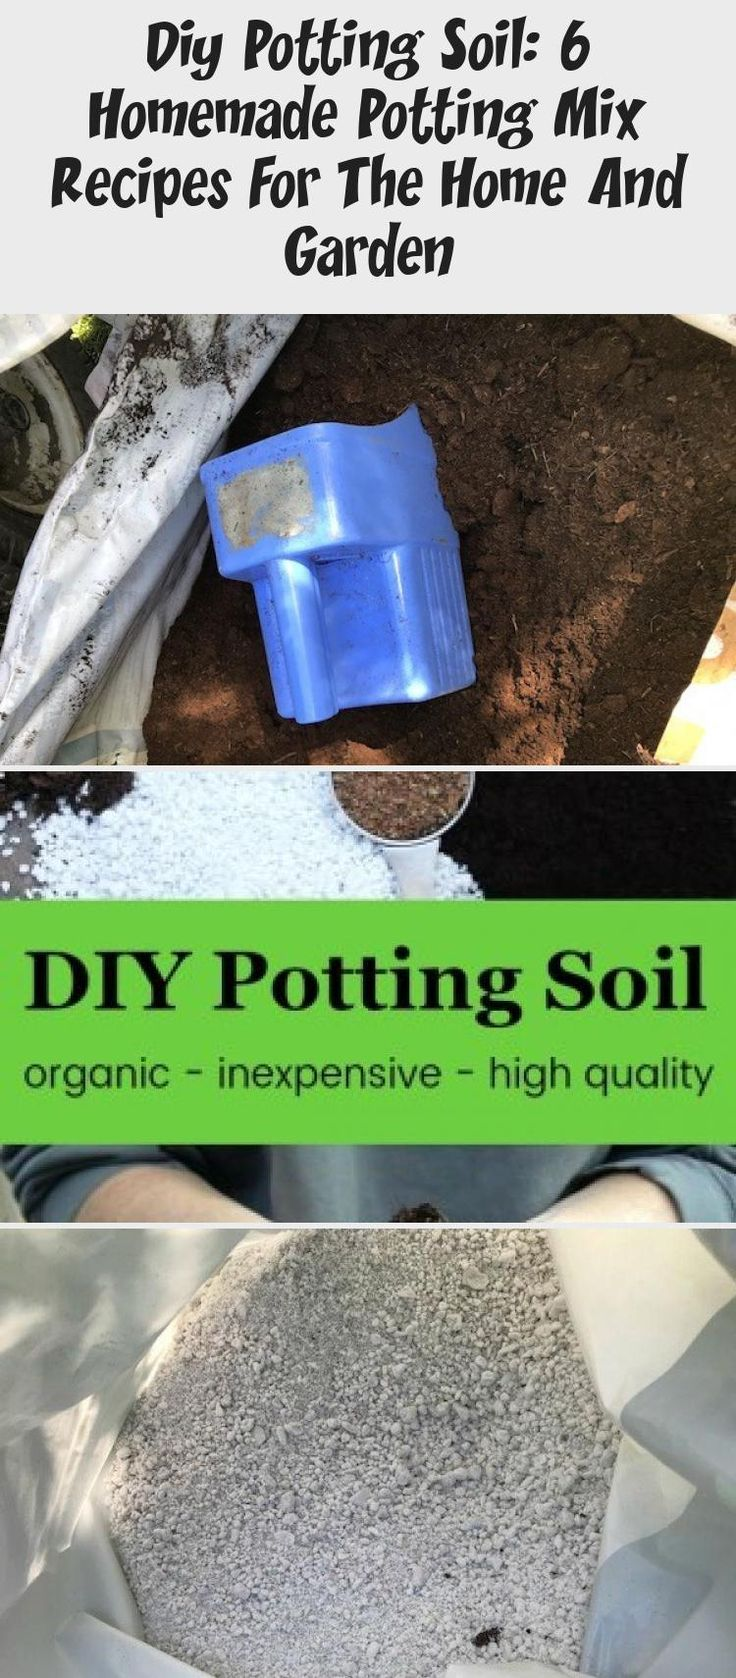 Diy potting soil 6 homemade potting mix recipes for the